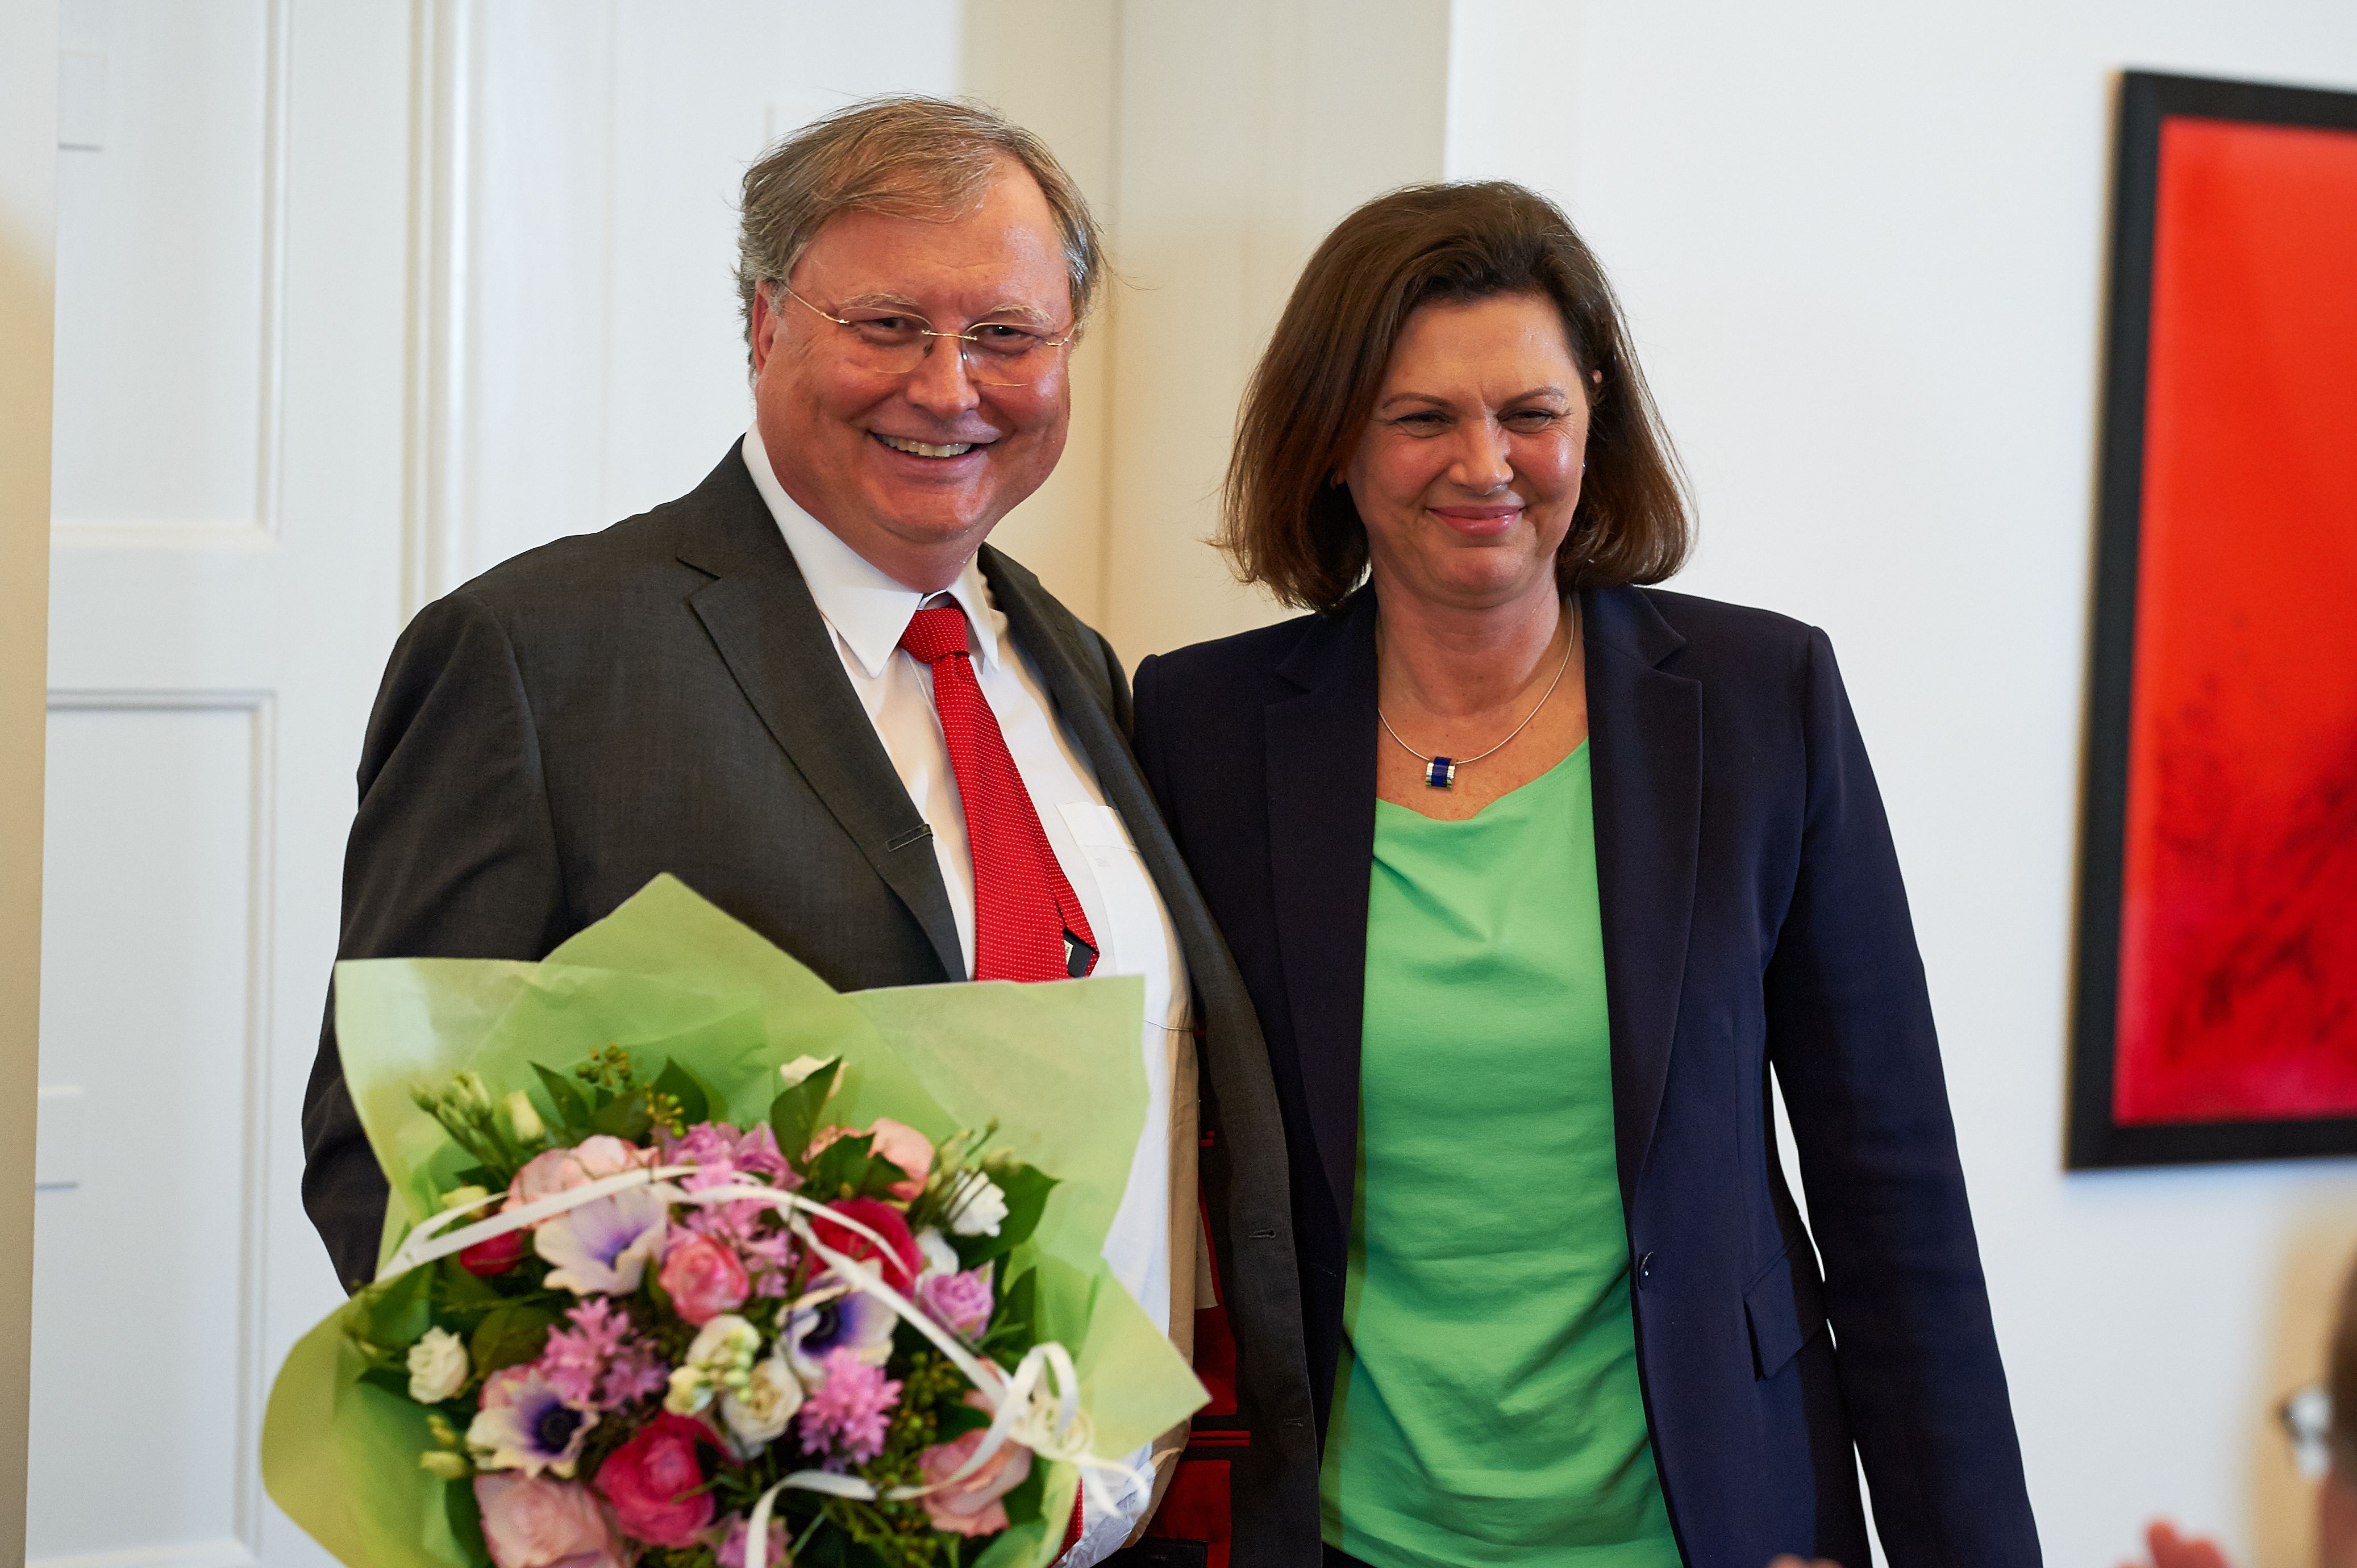 stephan heller 13 - Ilse Aigner zu Gast bei heller & partner